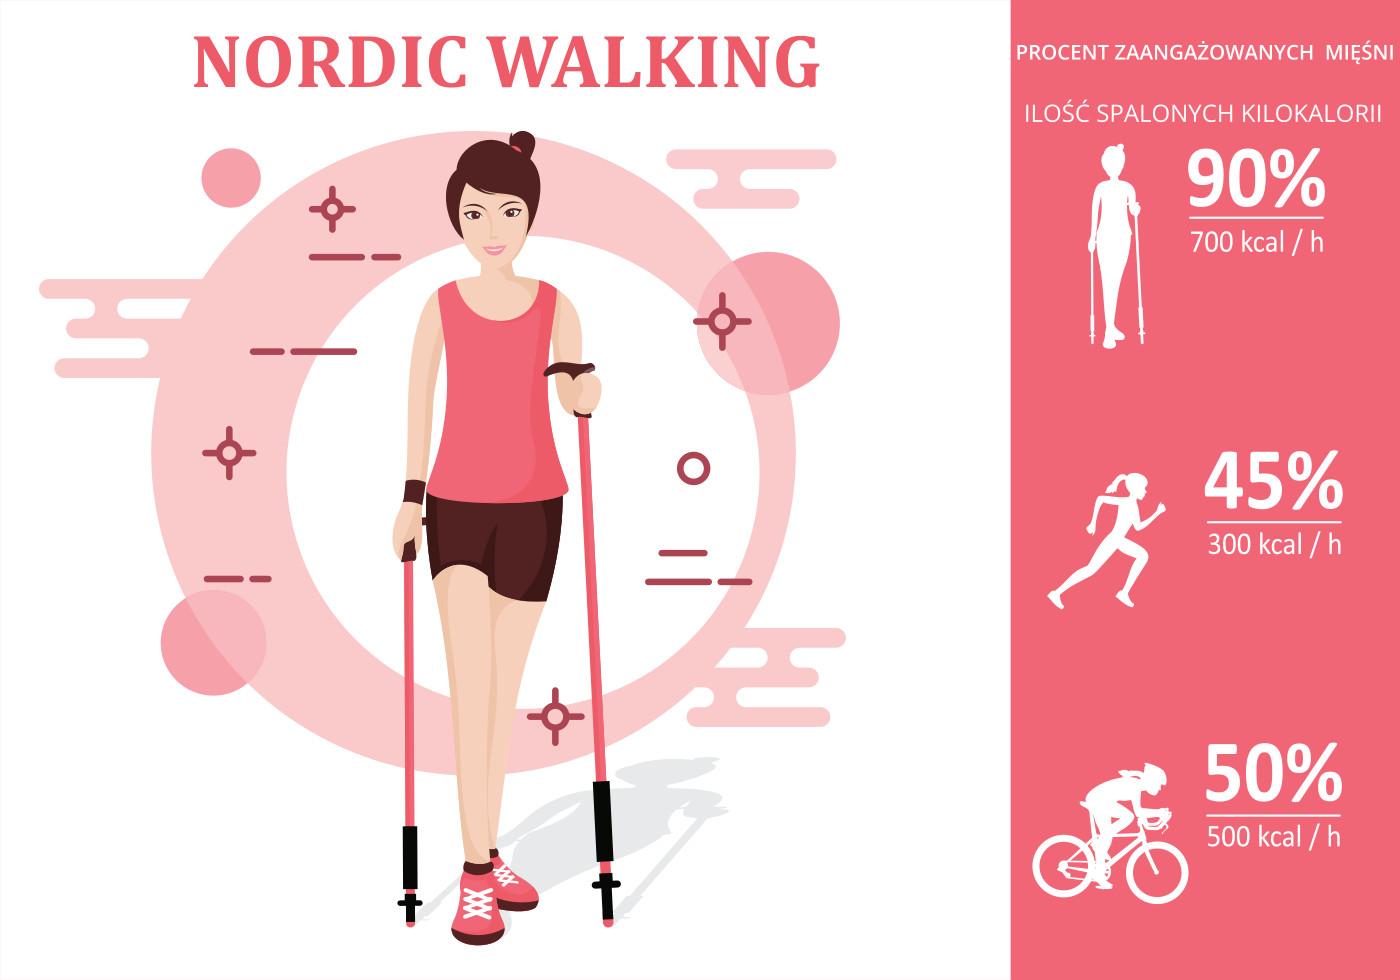 Mięśnie w Nordic Walking